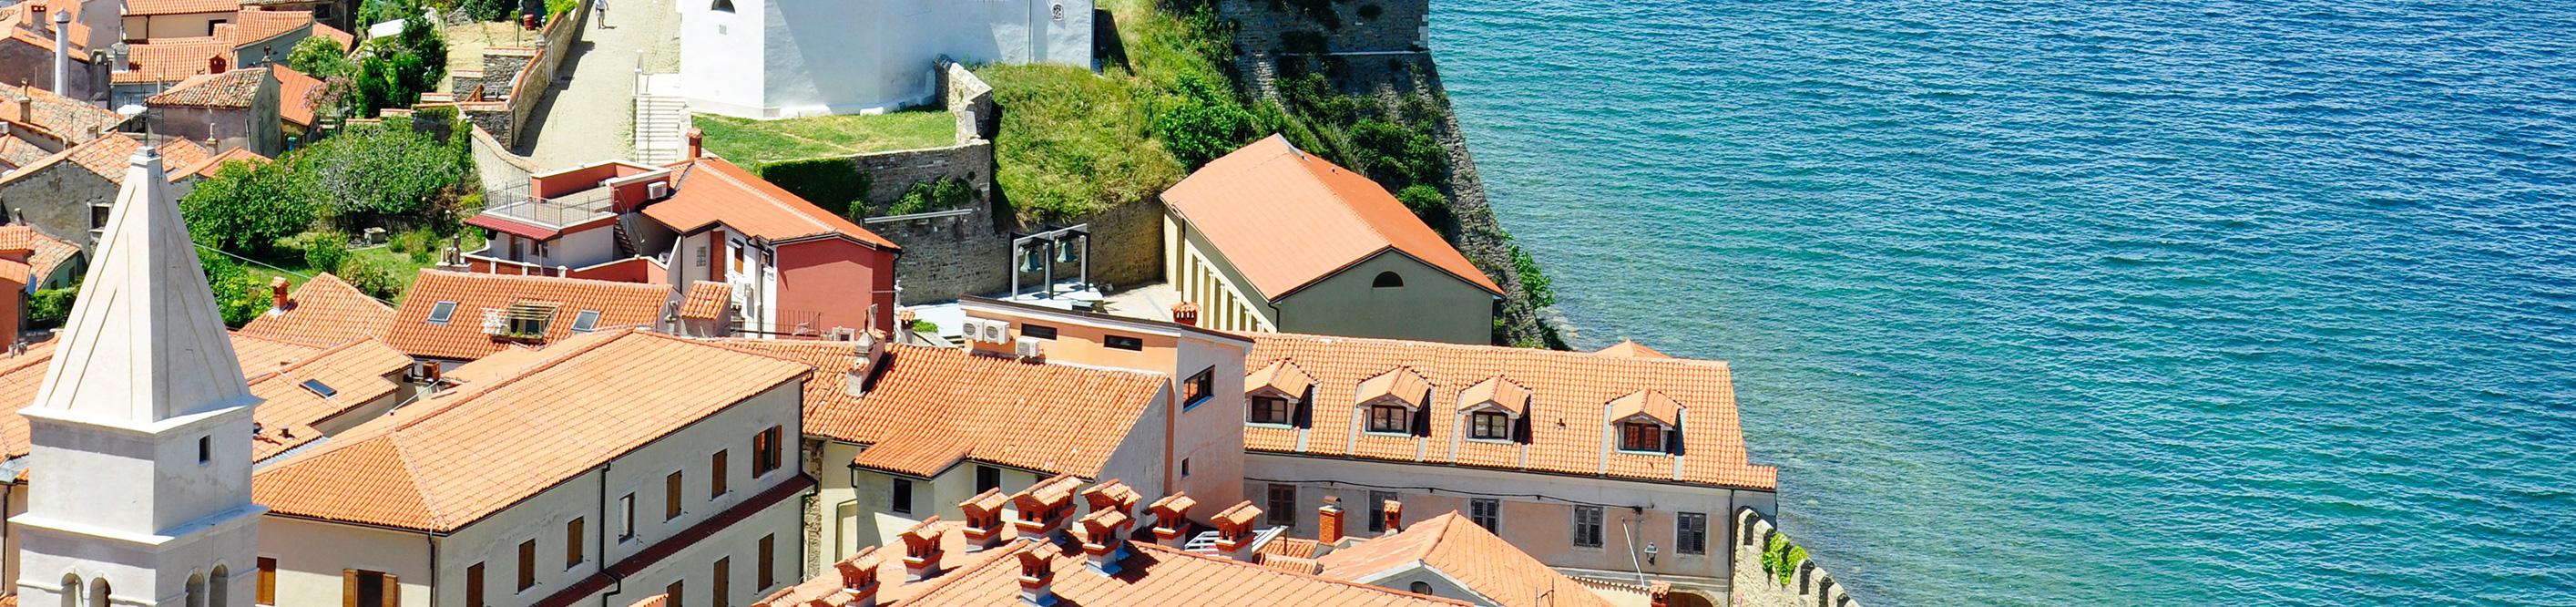 Mediterranean Sea cabin charters